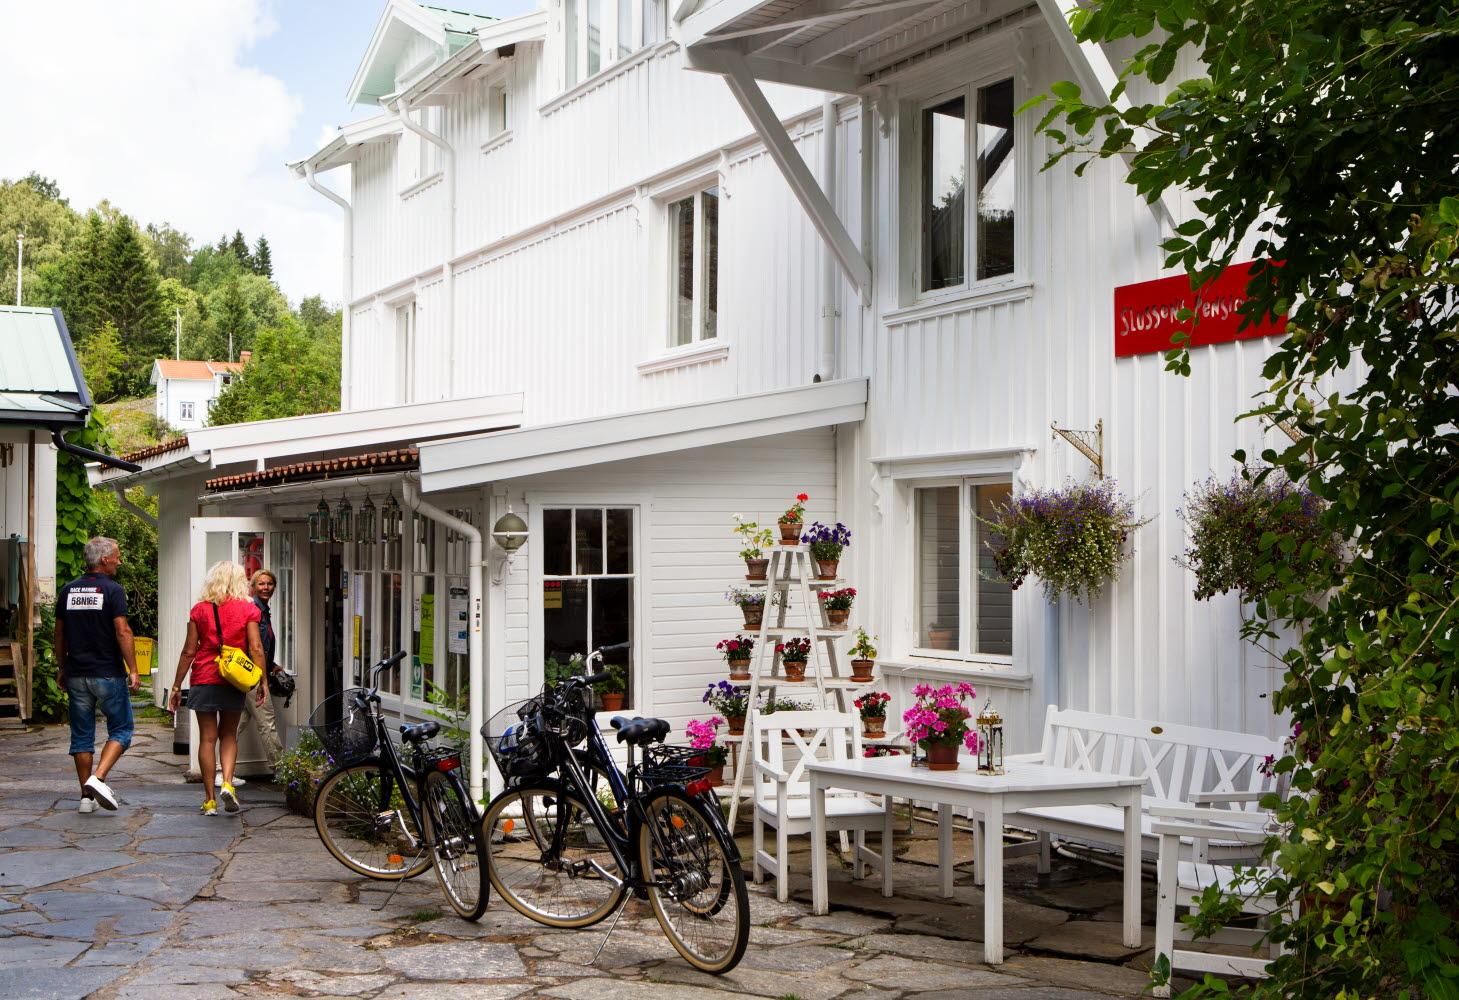 Cykel Orust-Slussen Pensionat - Photo Cred Roger Borgelid